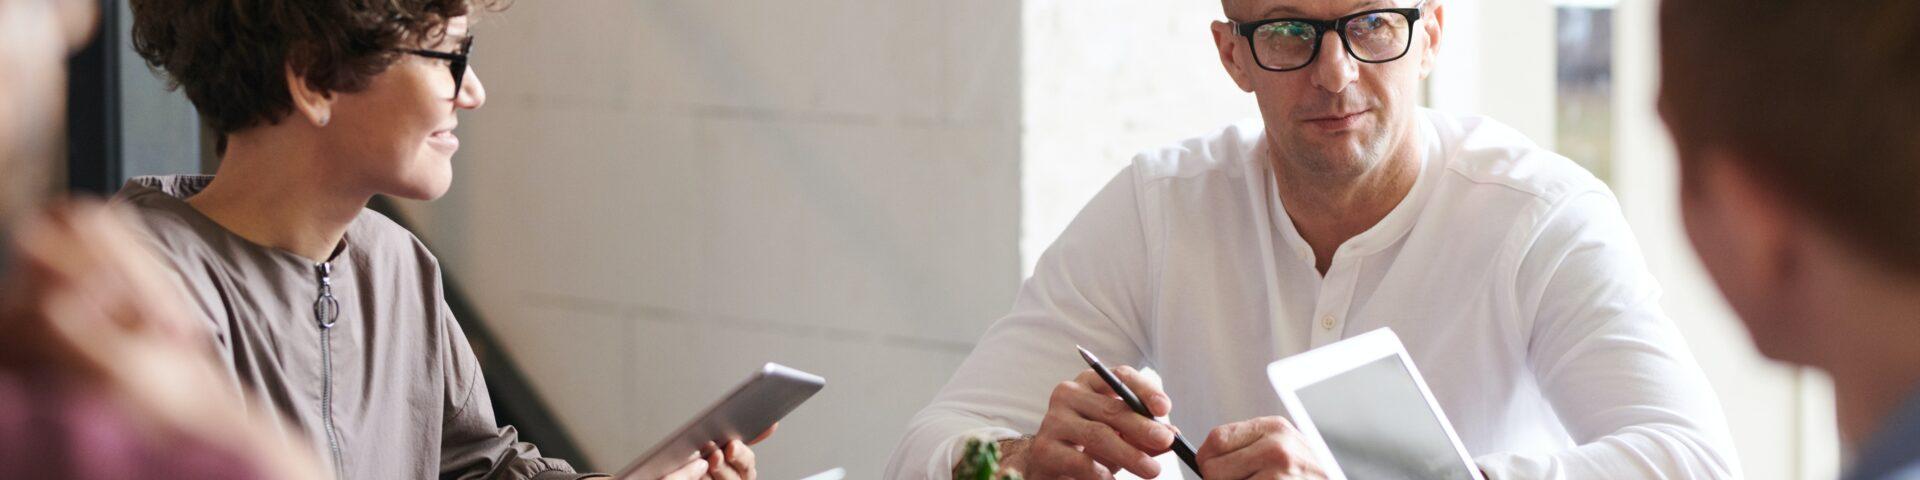 mensen in gesprek let op afkoop klein pensioen